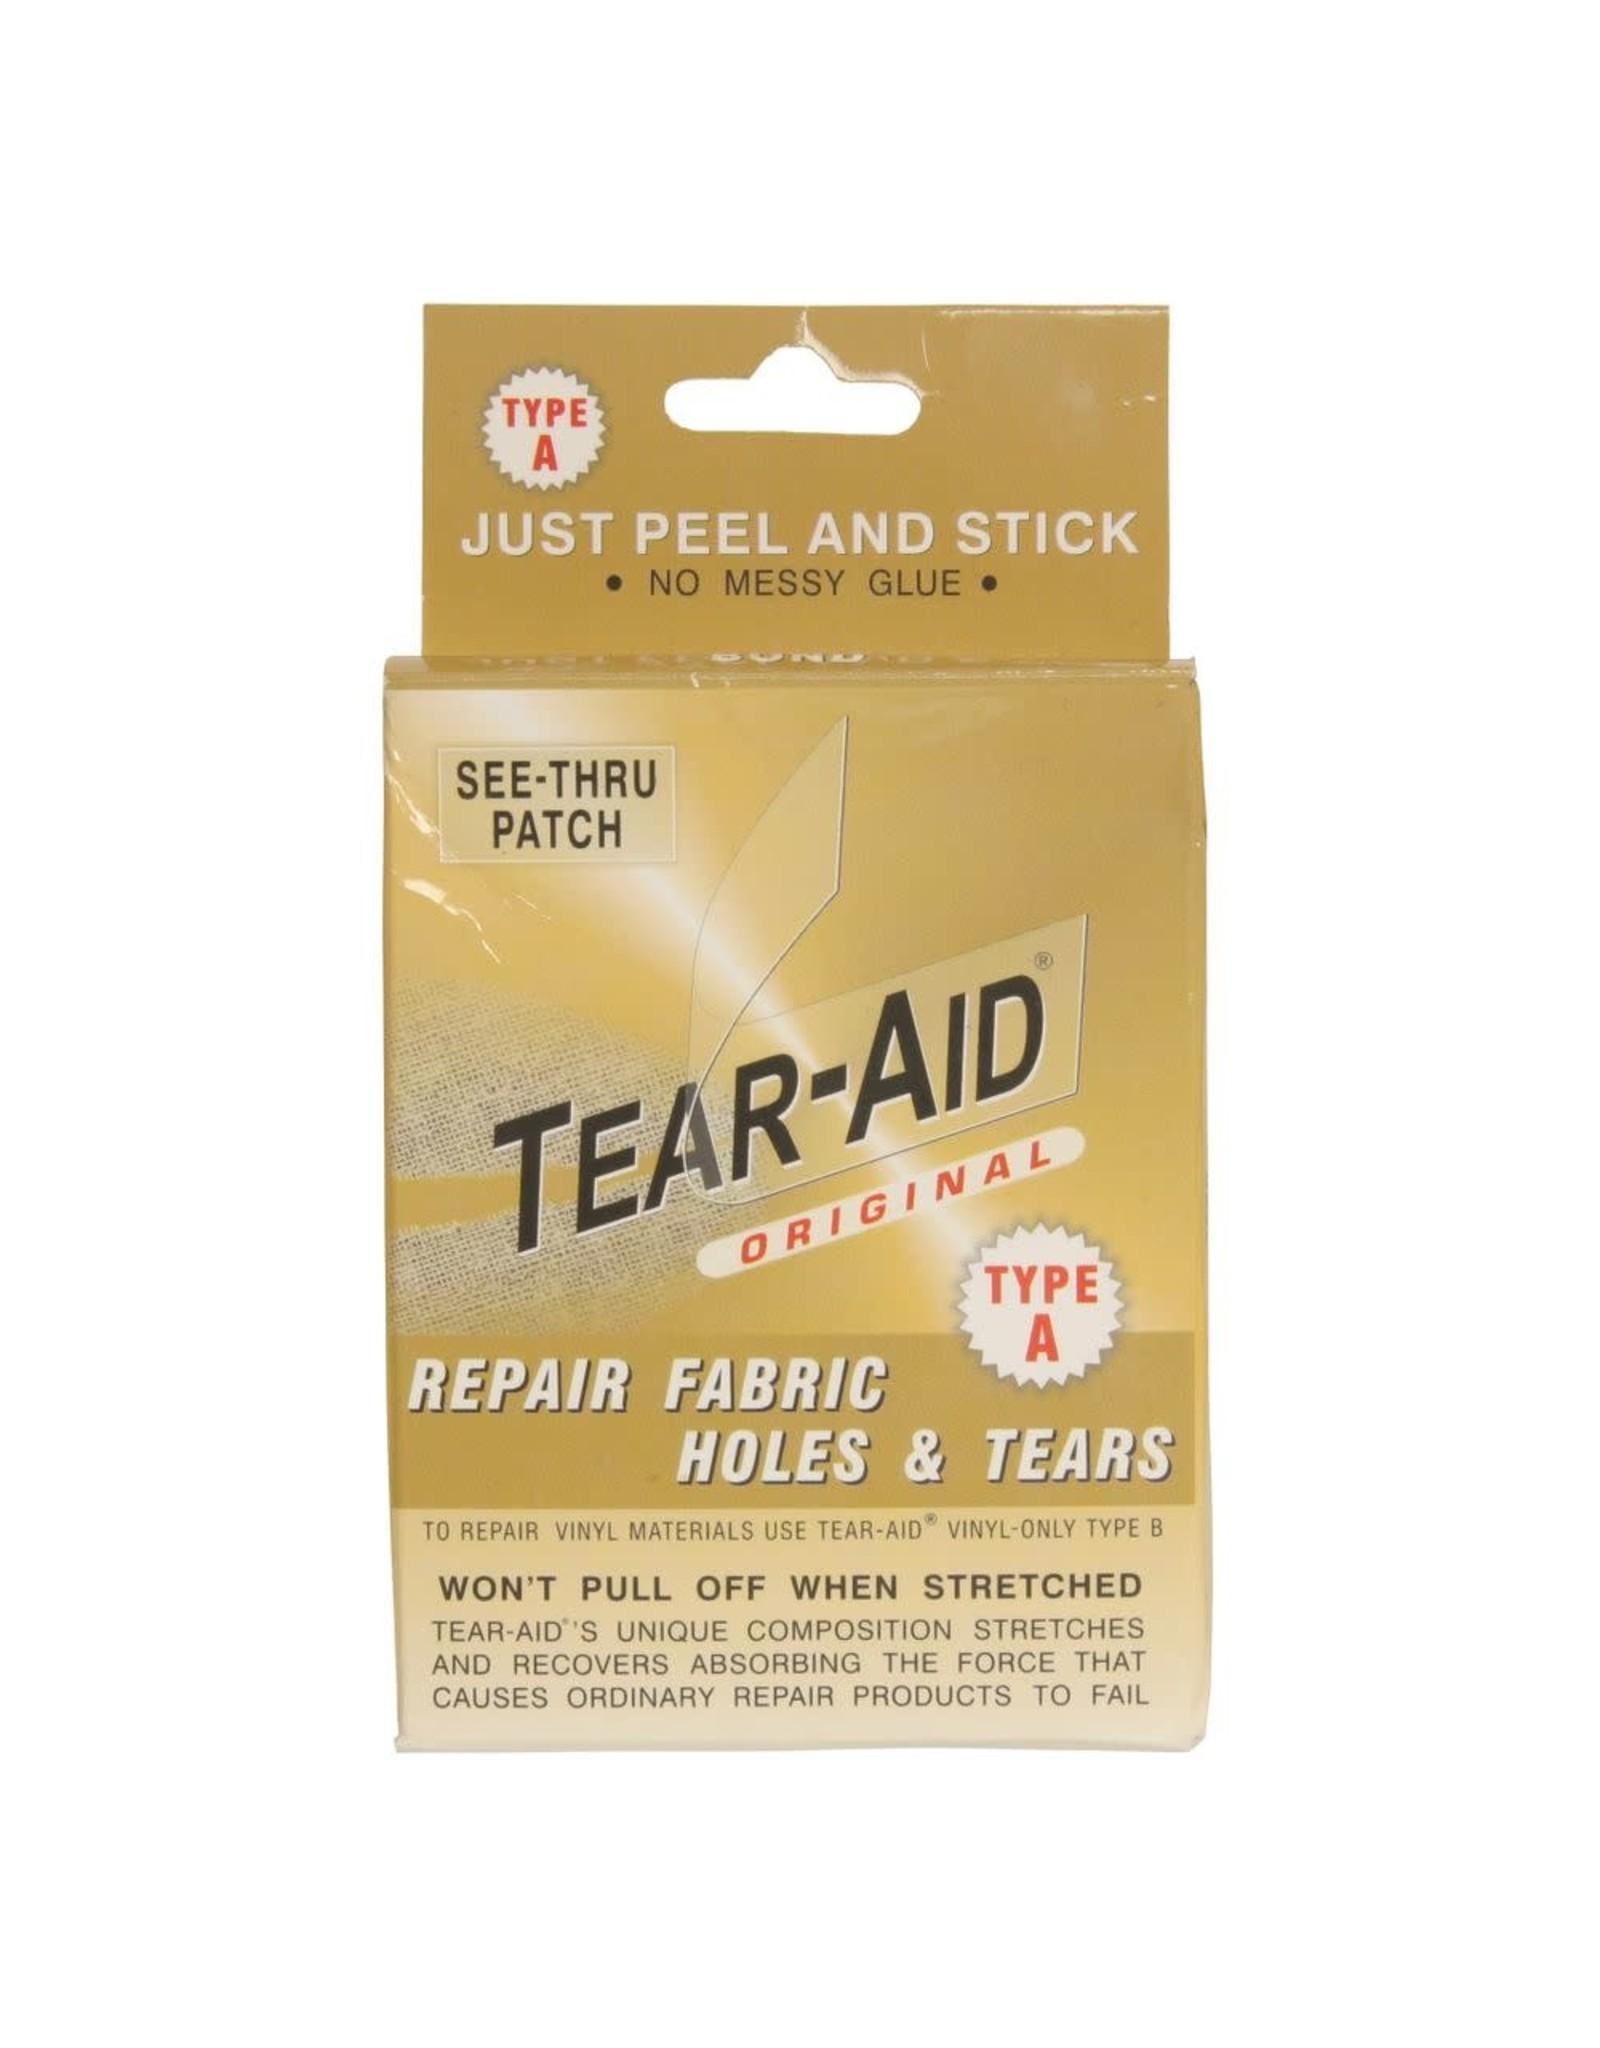 Tear-Aid Tear-Aid original Type A